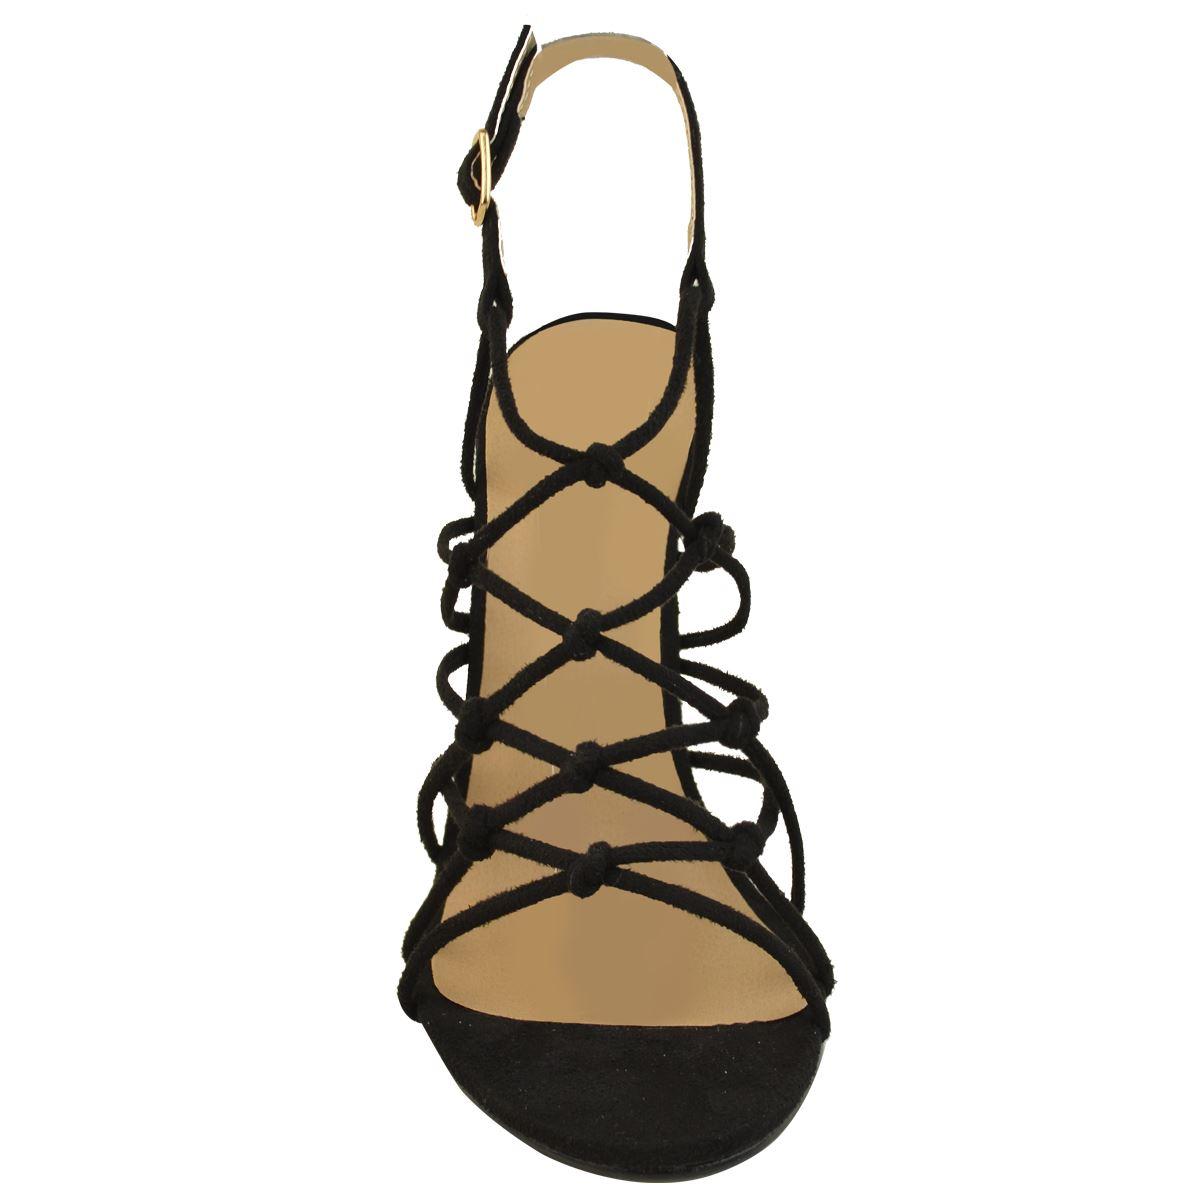 Womens Stilleto High Heel Party Sandals Nude Black Wedding Strappy Buckle Size